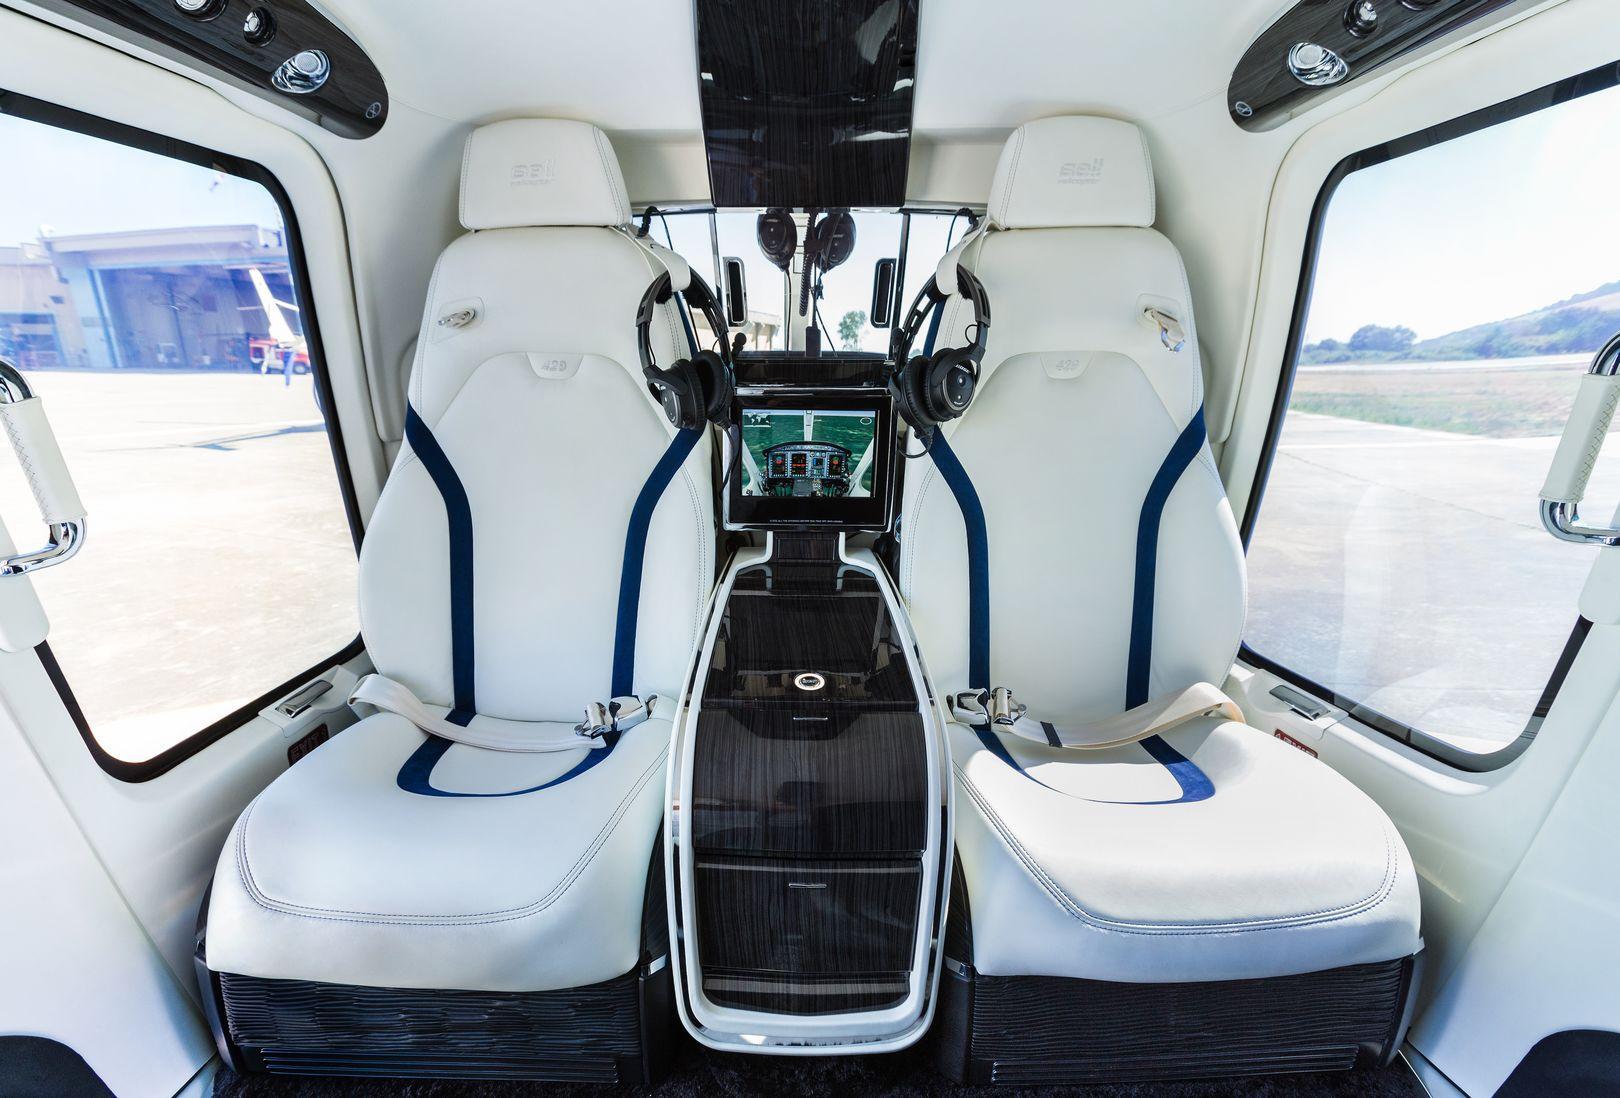 Роскошный салон Bell 429 представлен на выставке EBACE 2019